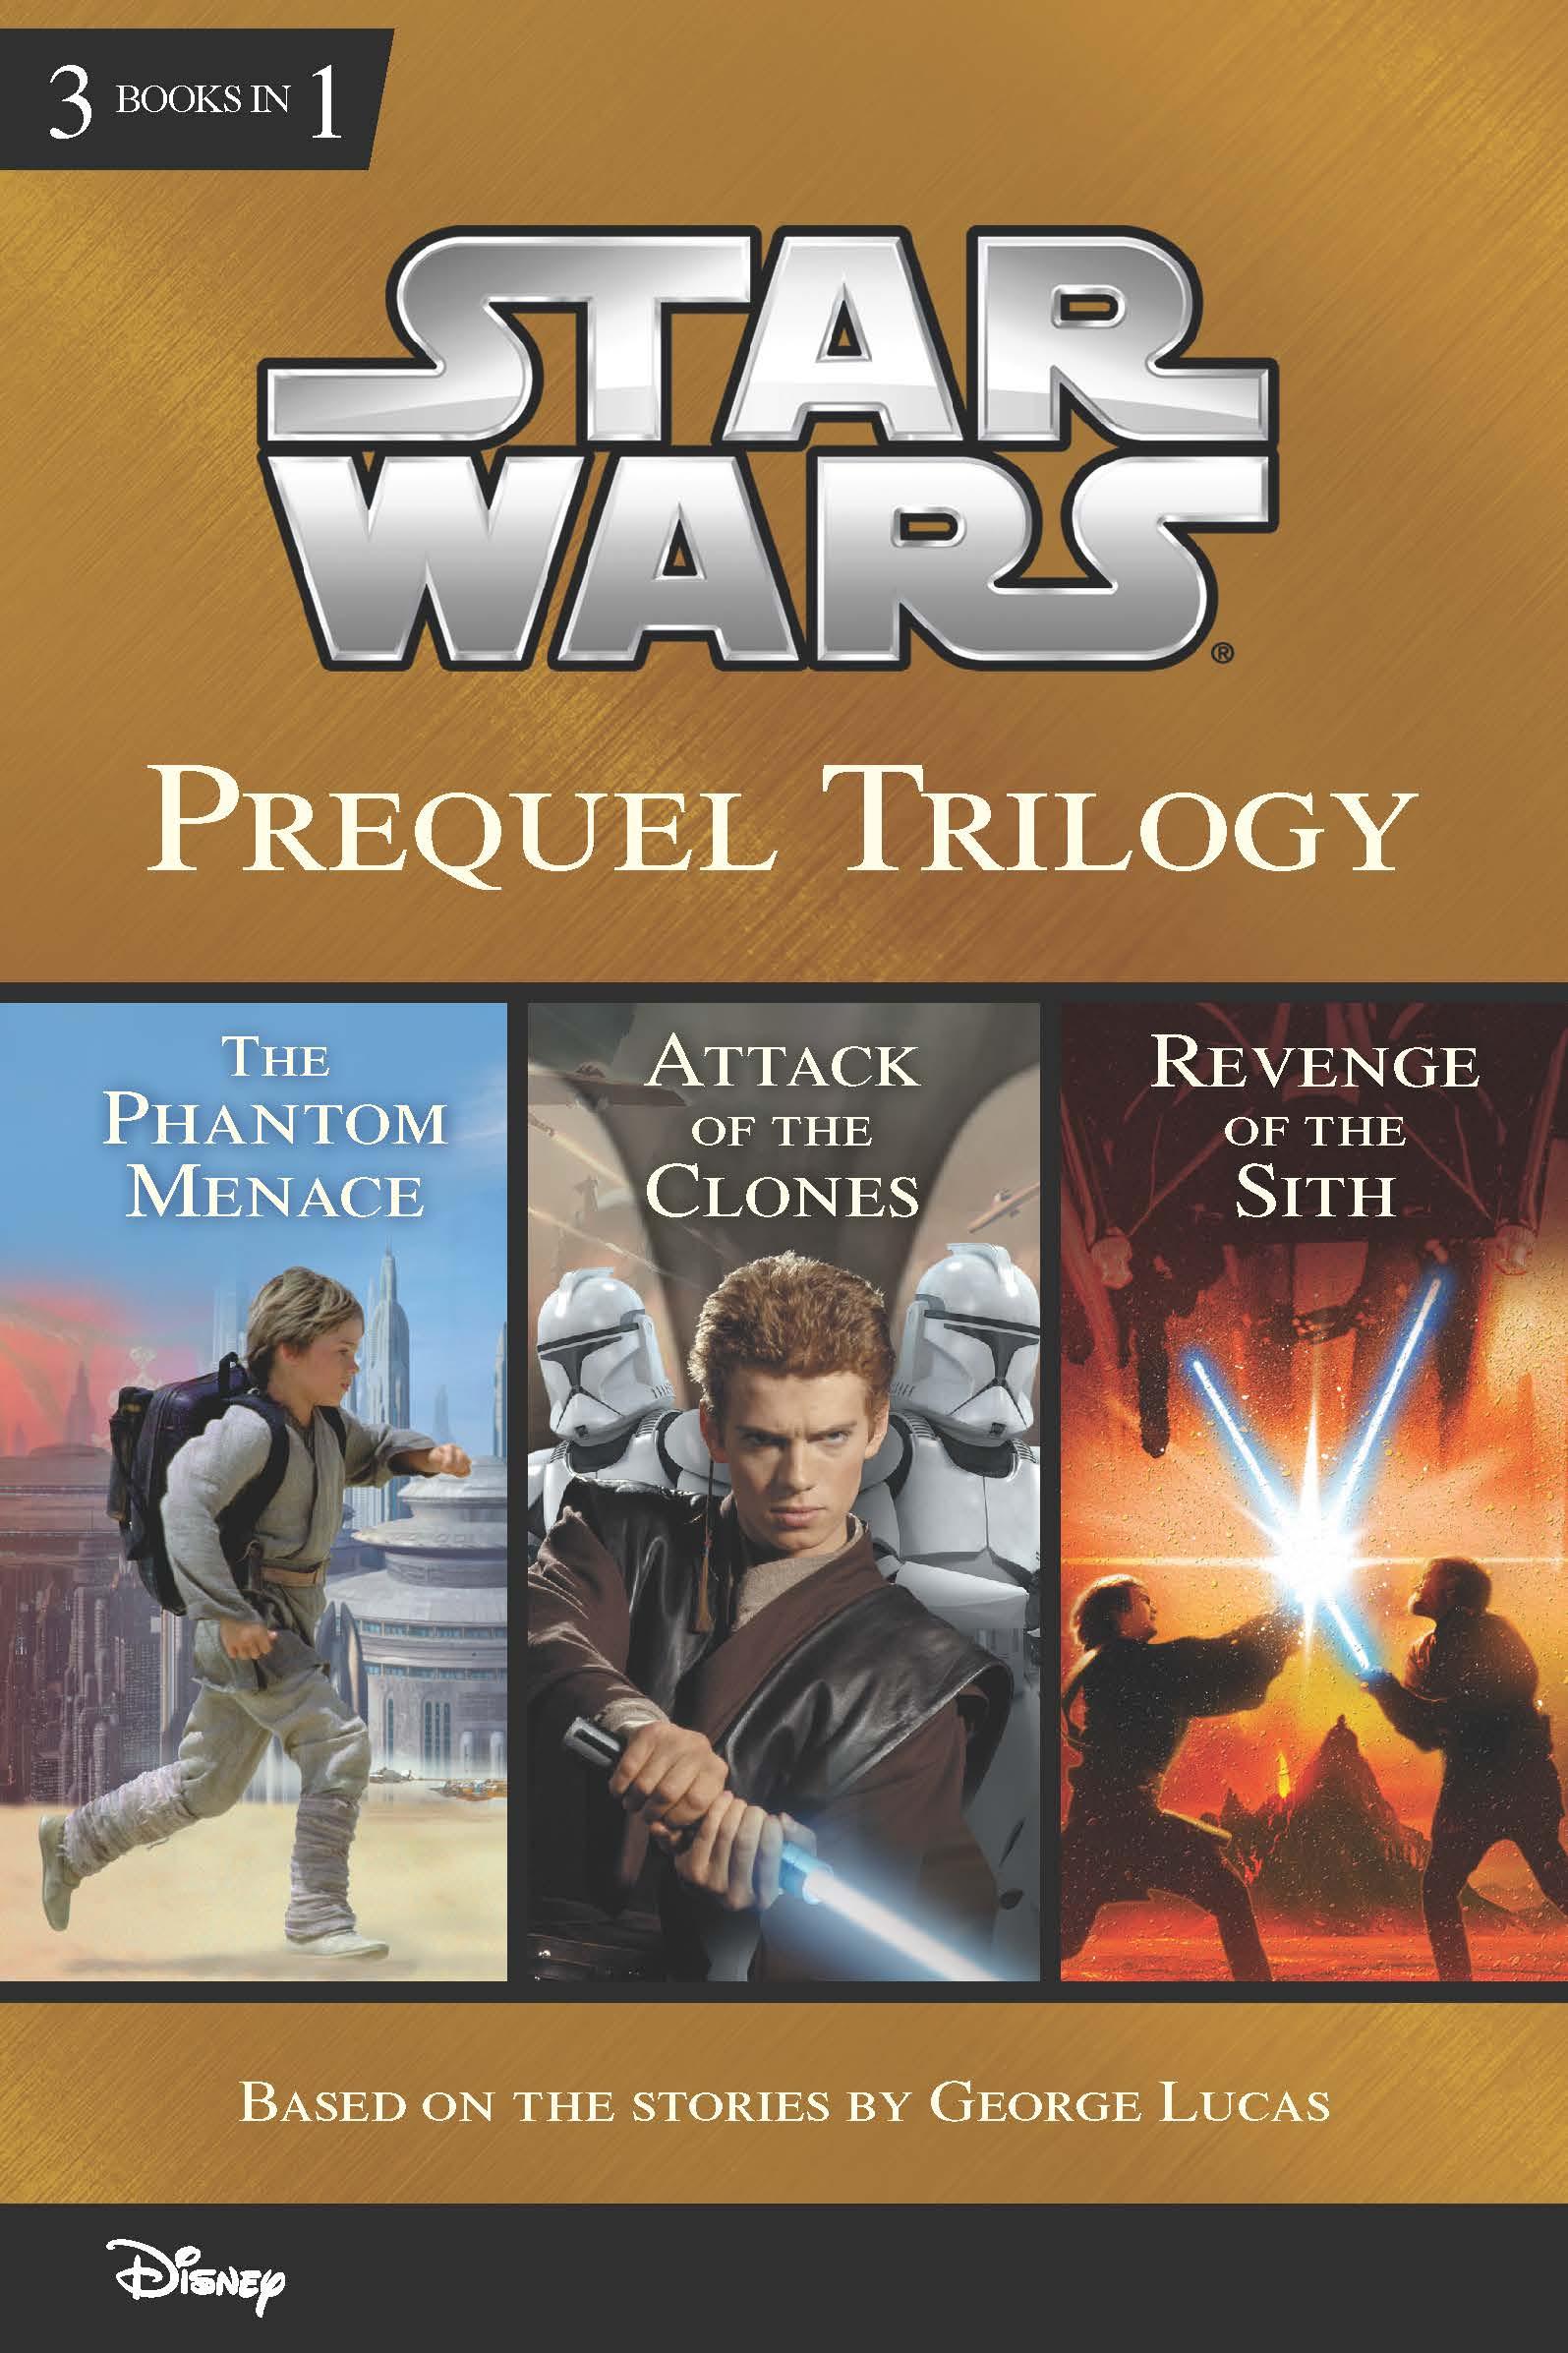 Star Wars Prequel Trilogy Disney Books Disney Publishing Worldwide